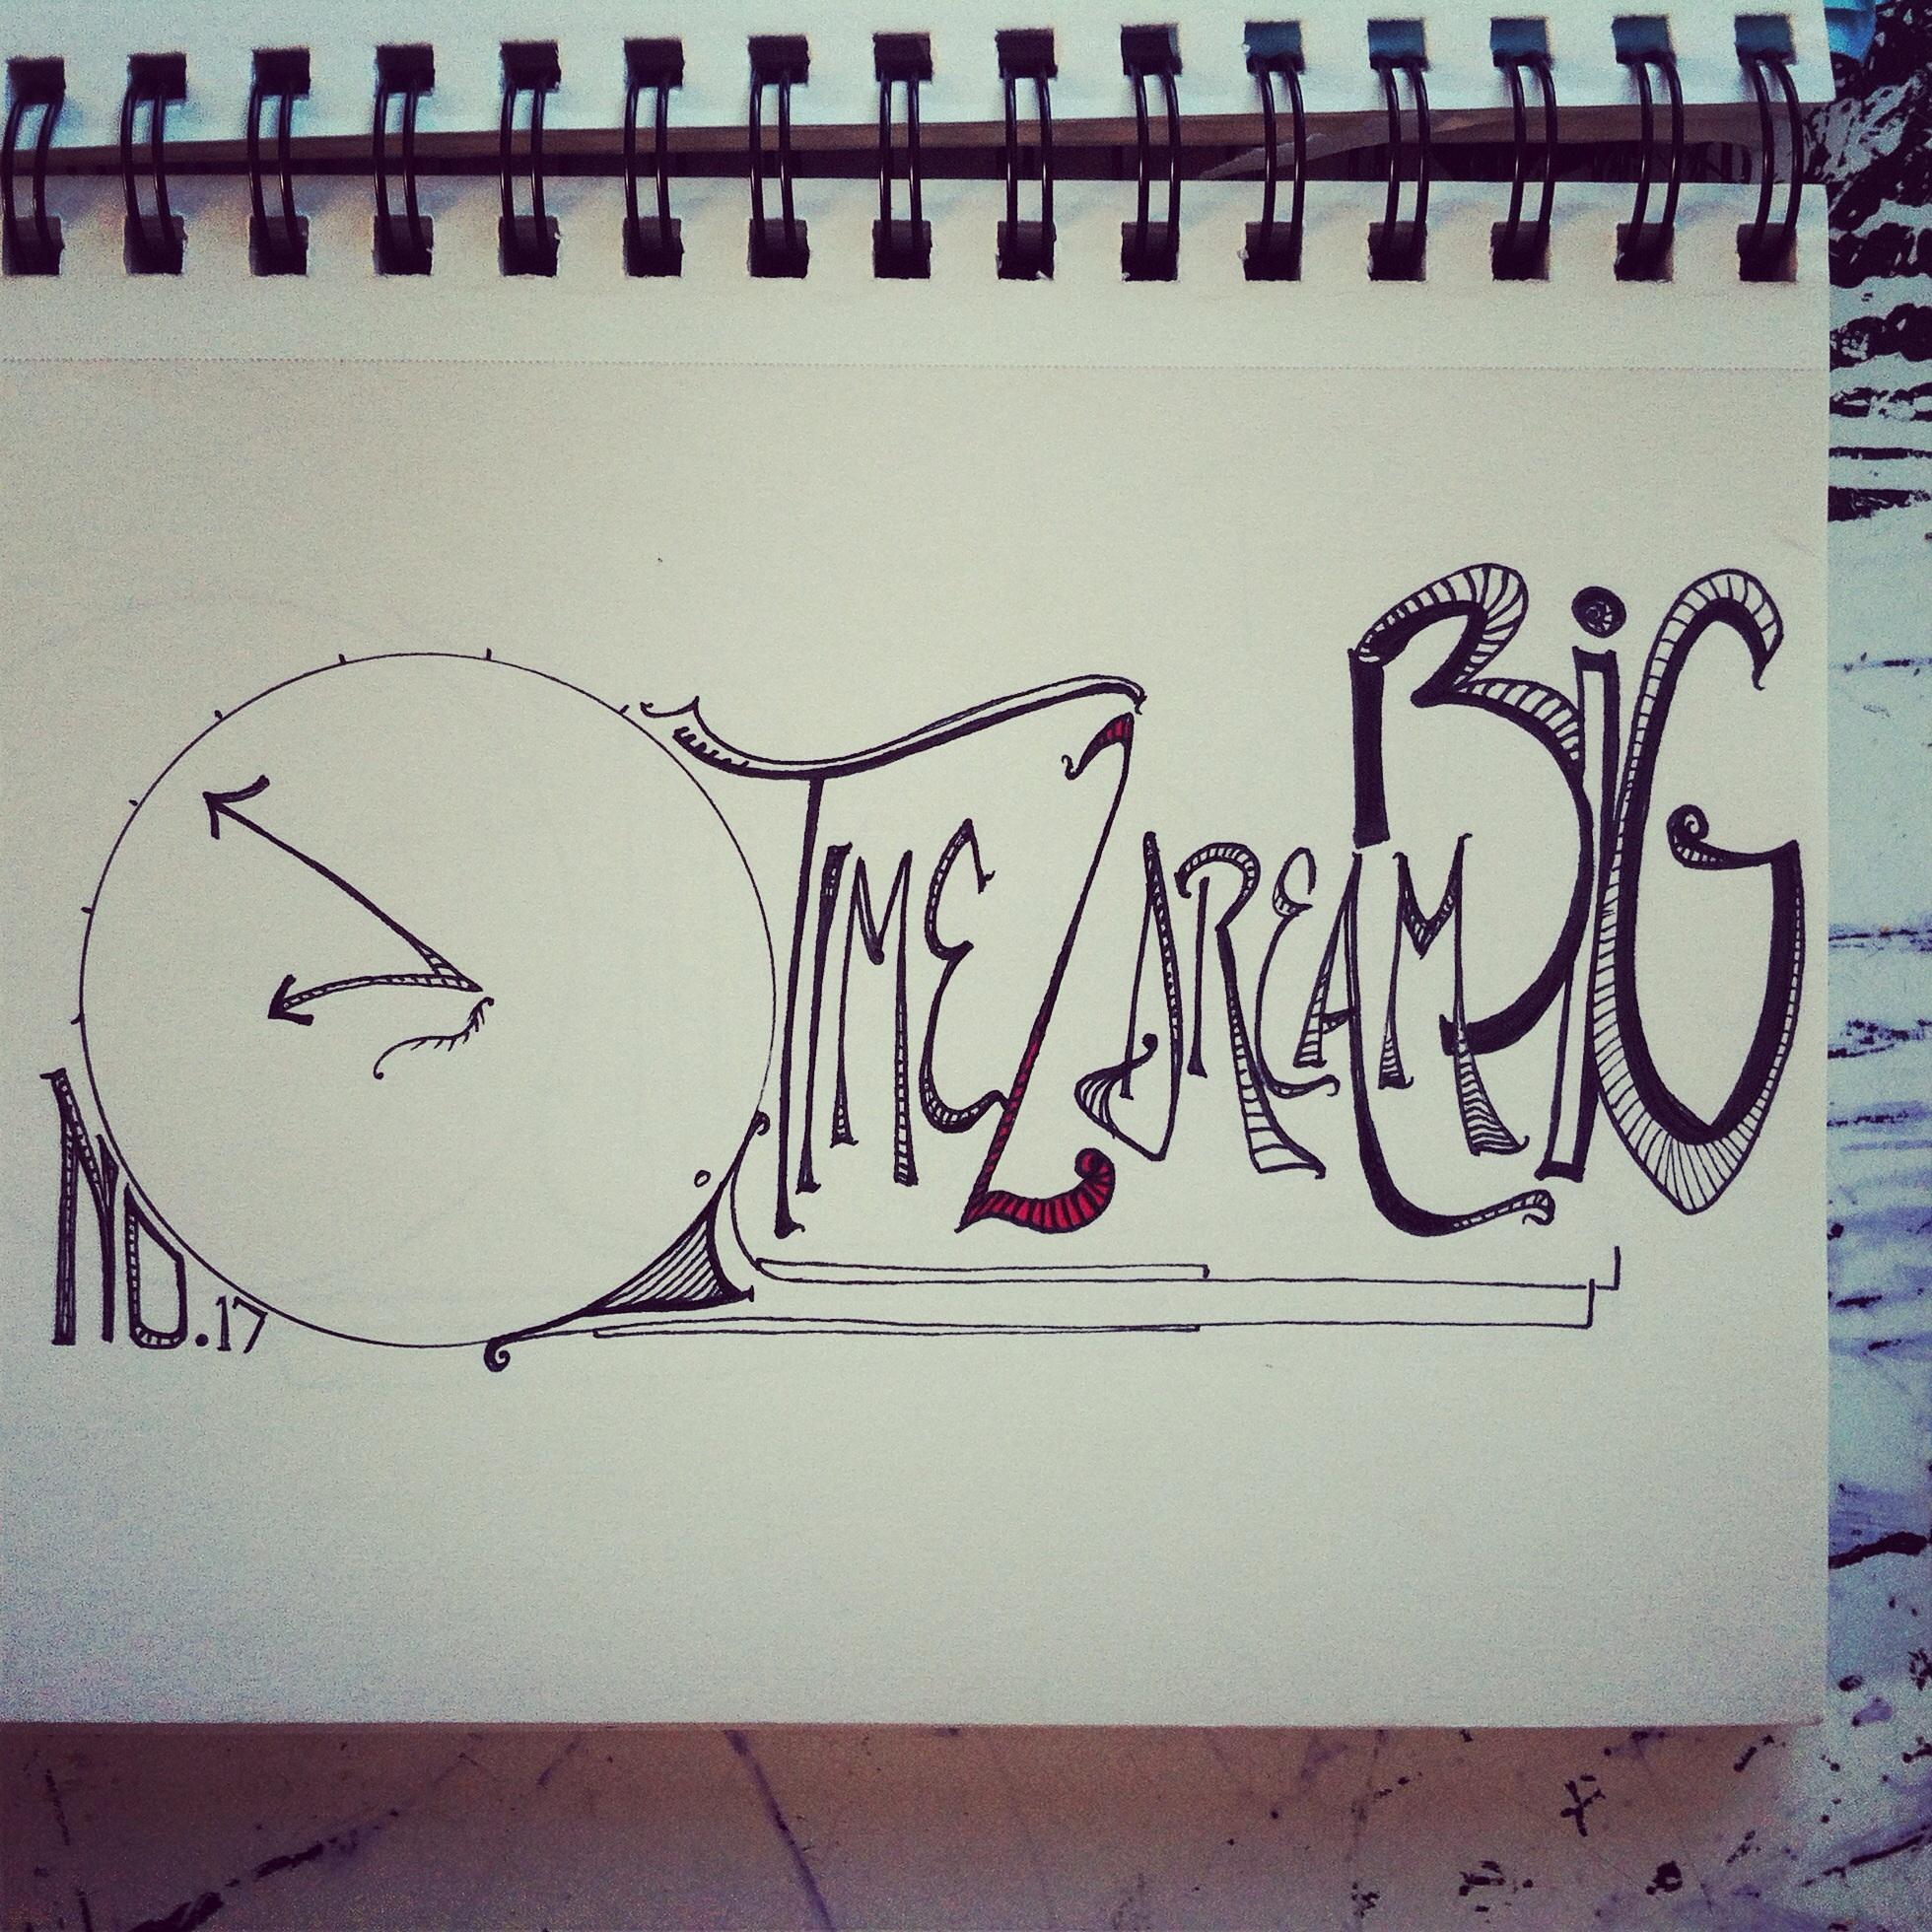 TIME 2 dream BIG